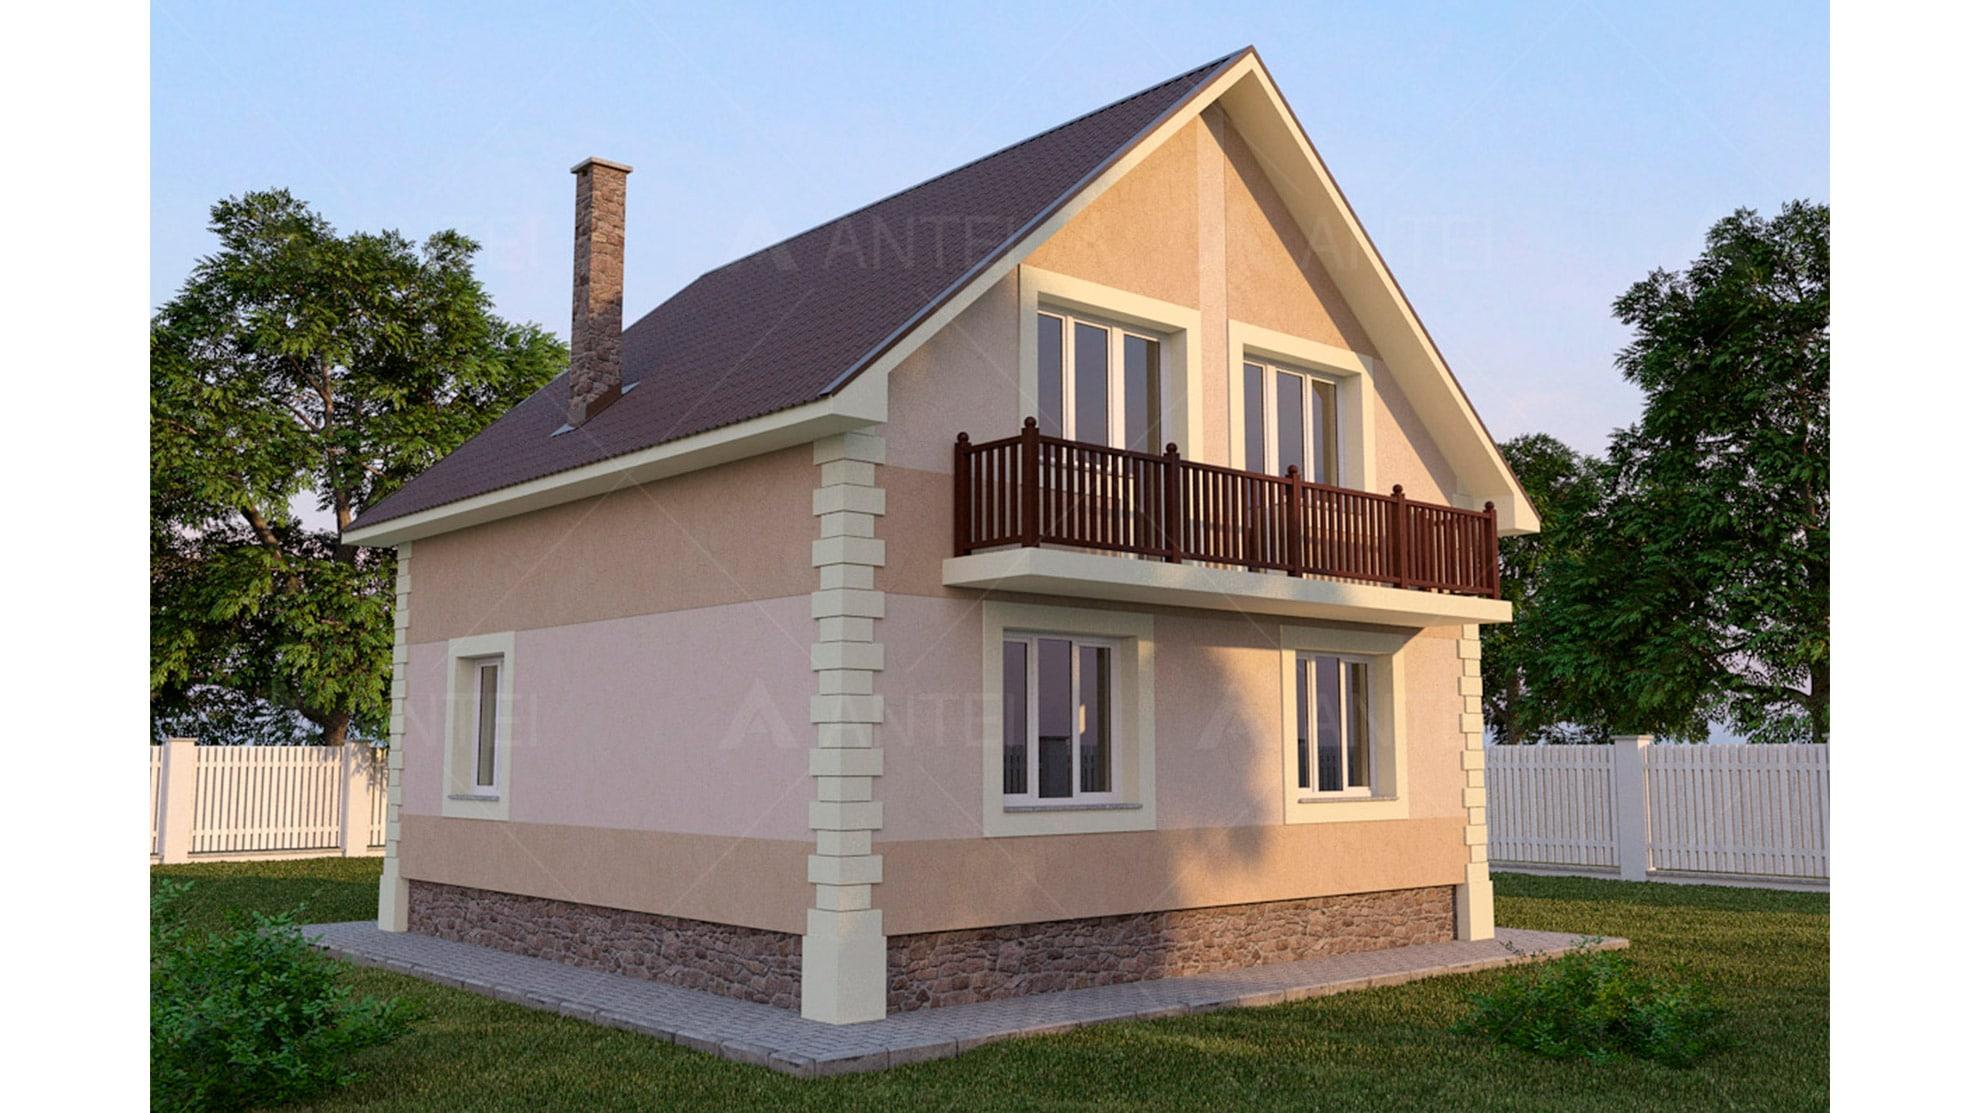 Проект мансардного дома с балконом «КМ-51» - фото №2